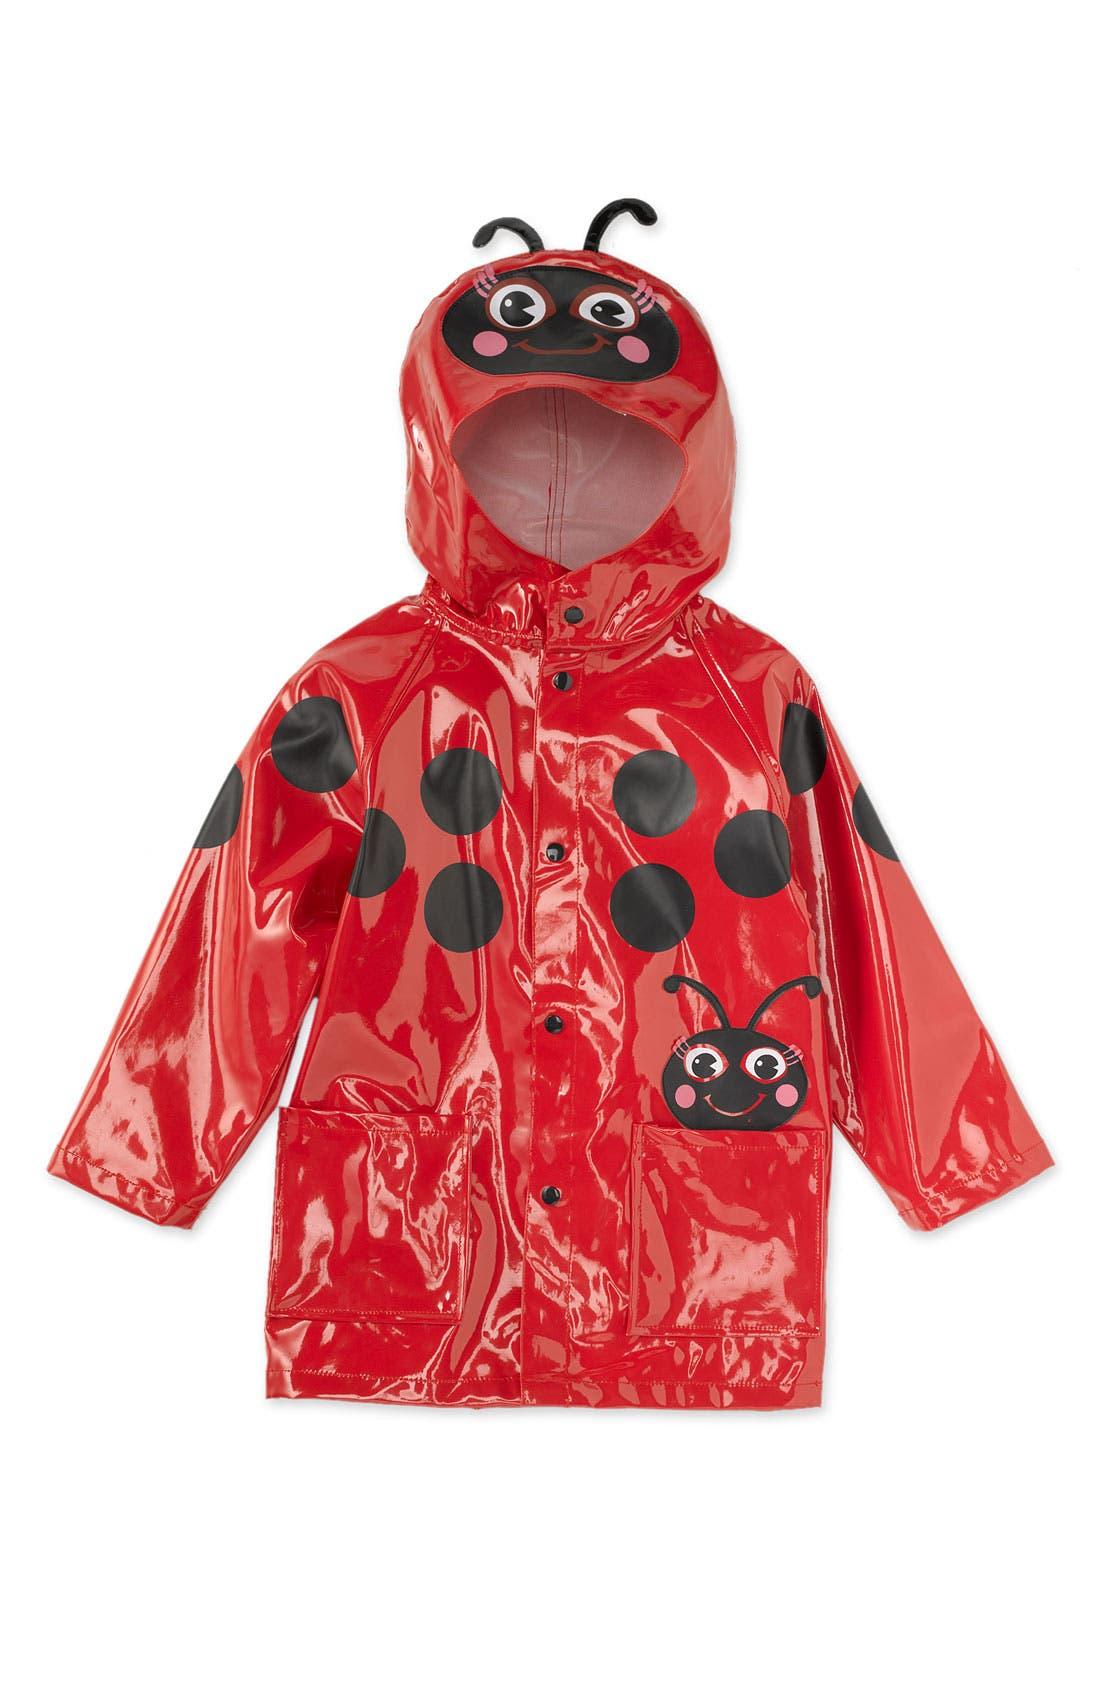 Main Image - Western Chief 'Ladybug' Raincoat (Little Kid)